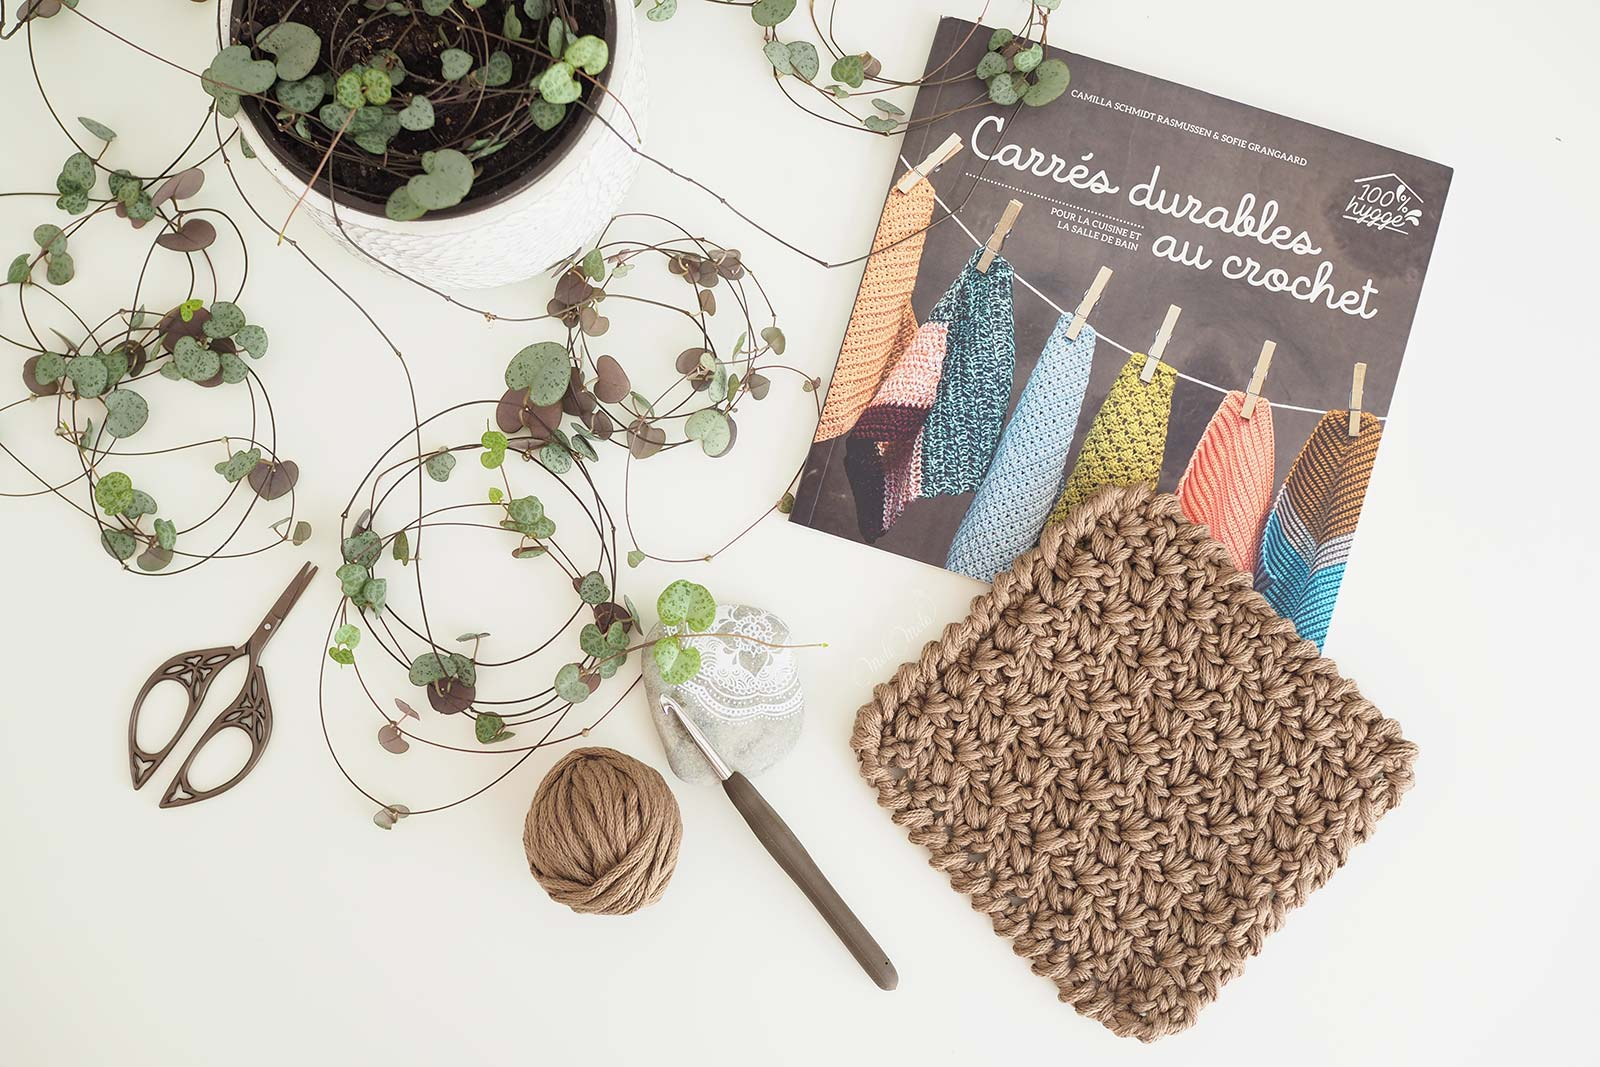 ceropegia-woodii-carres-durables-crochet-editions-mango-dmc-natura-xl-laboutiquedemelimelo